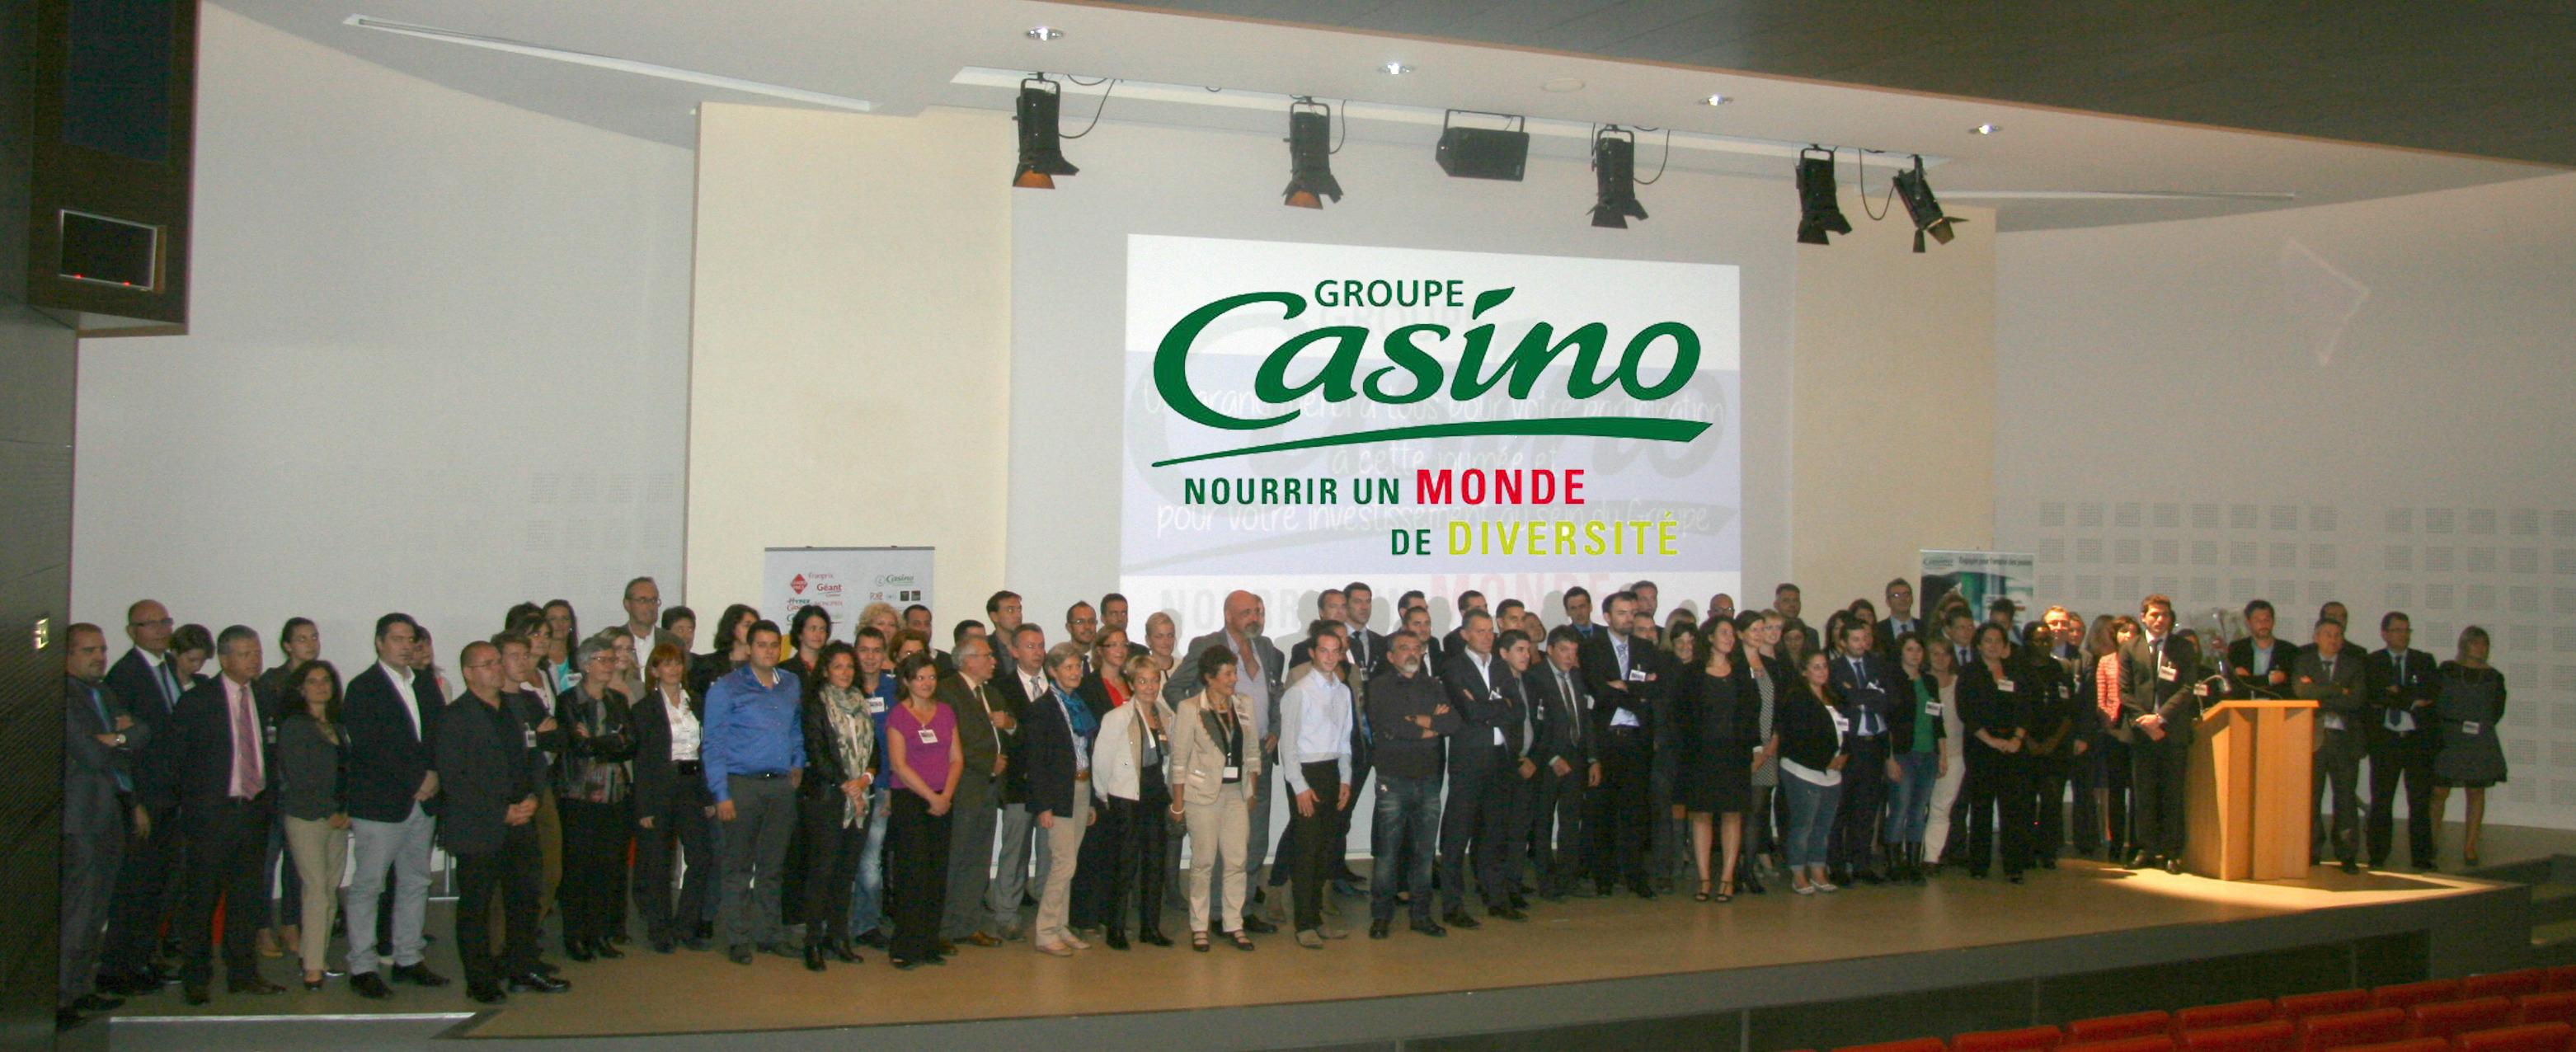 Geant casino saint etienne siege social casino 888 login